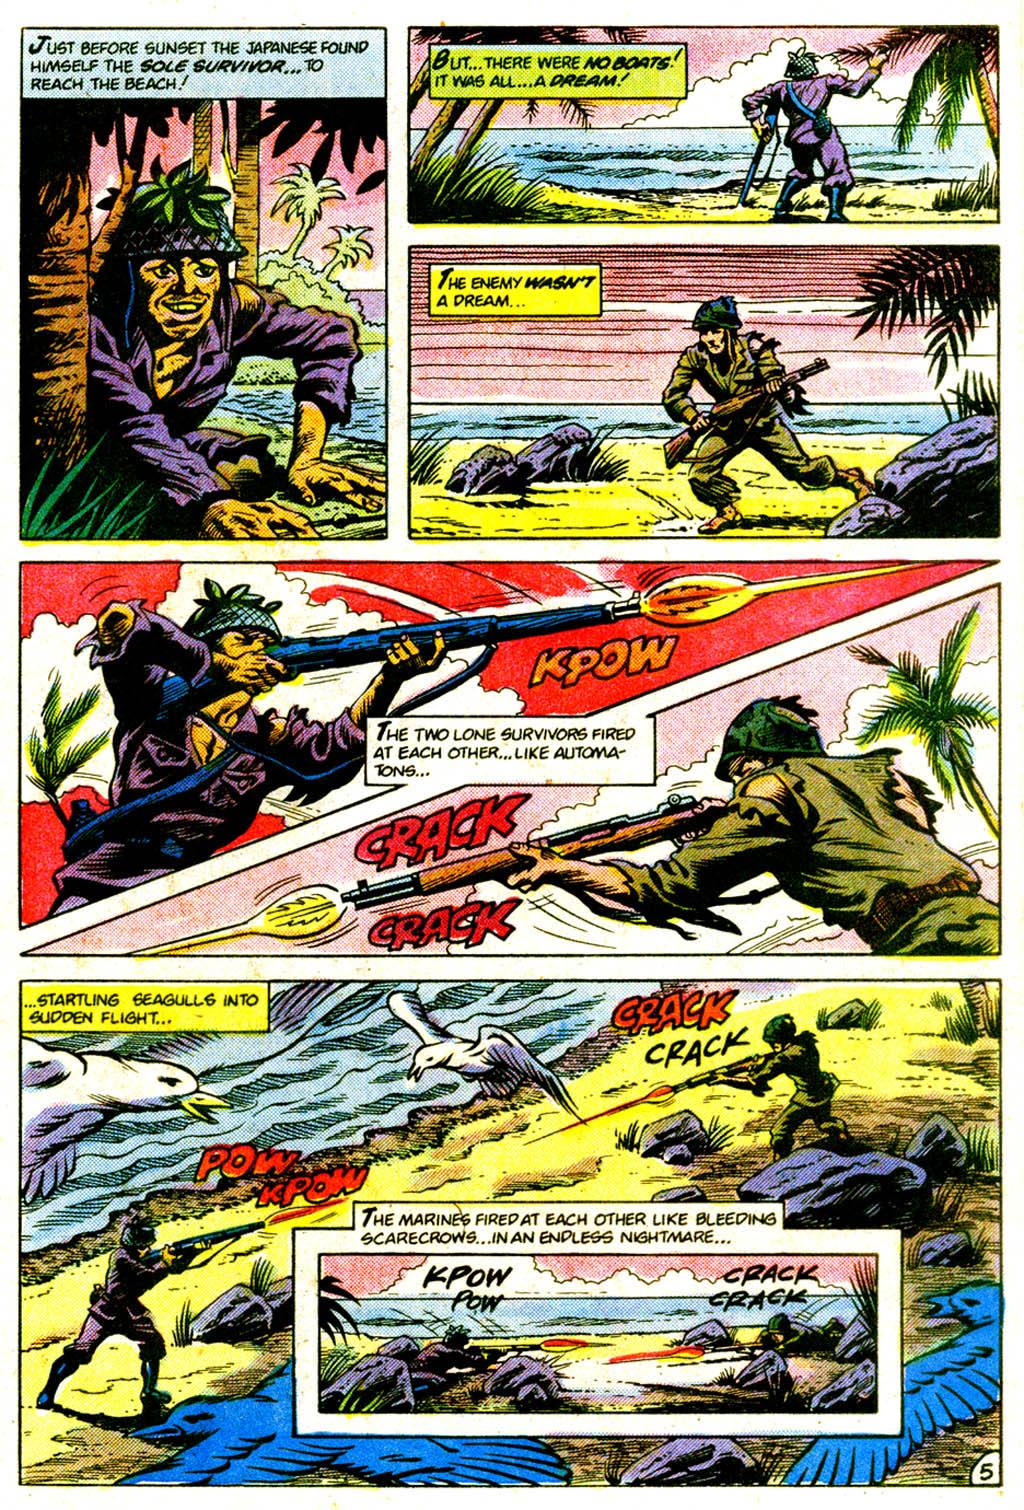 Read online Sgt. Rock comic -  Issue #375 - 30